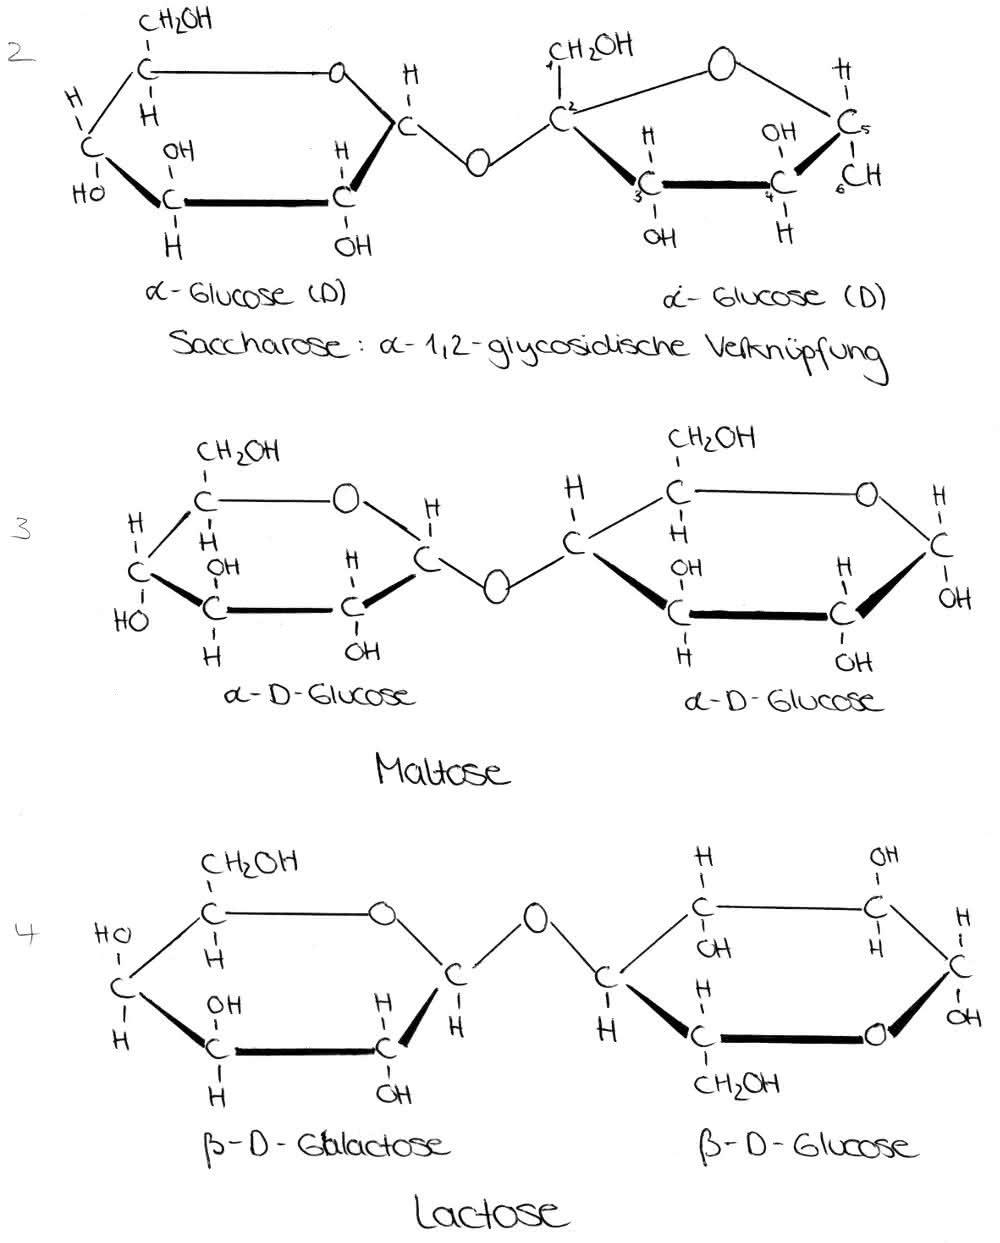 Organische Chemie Kohlenhydrate Disaccharide